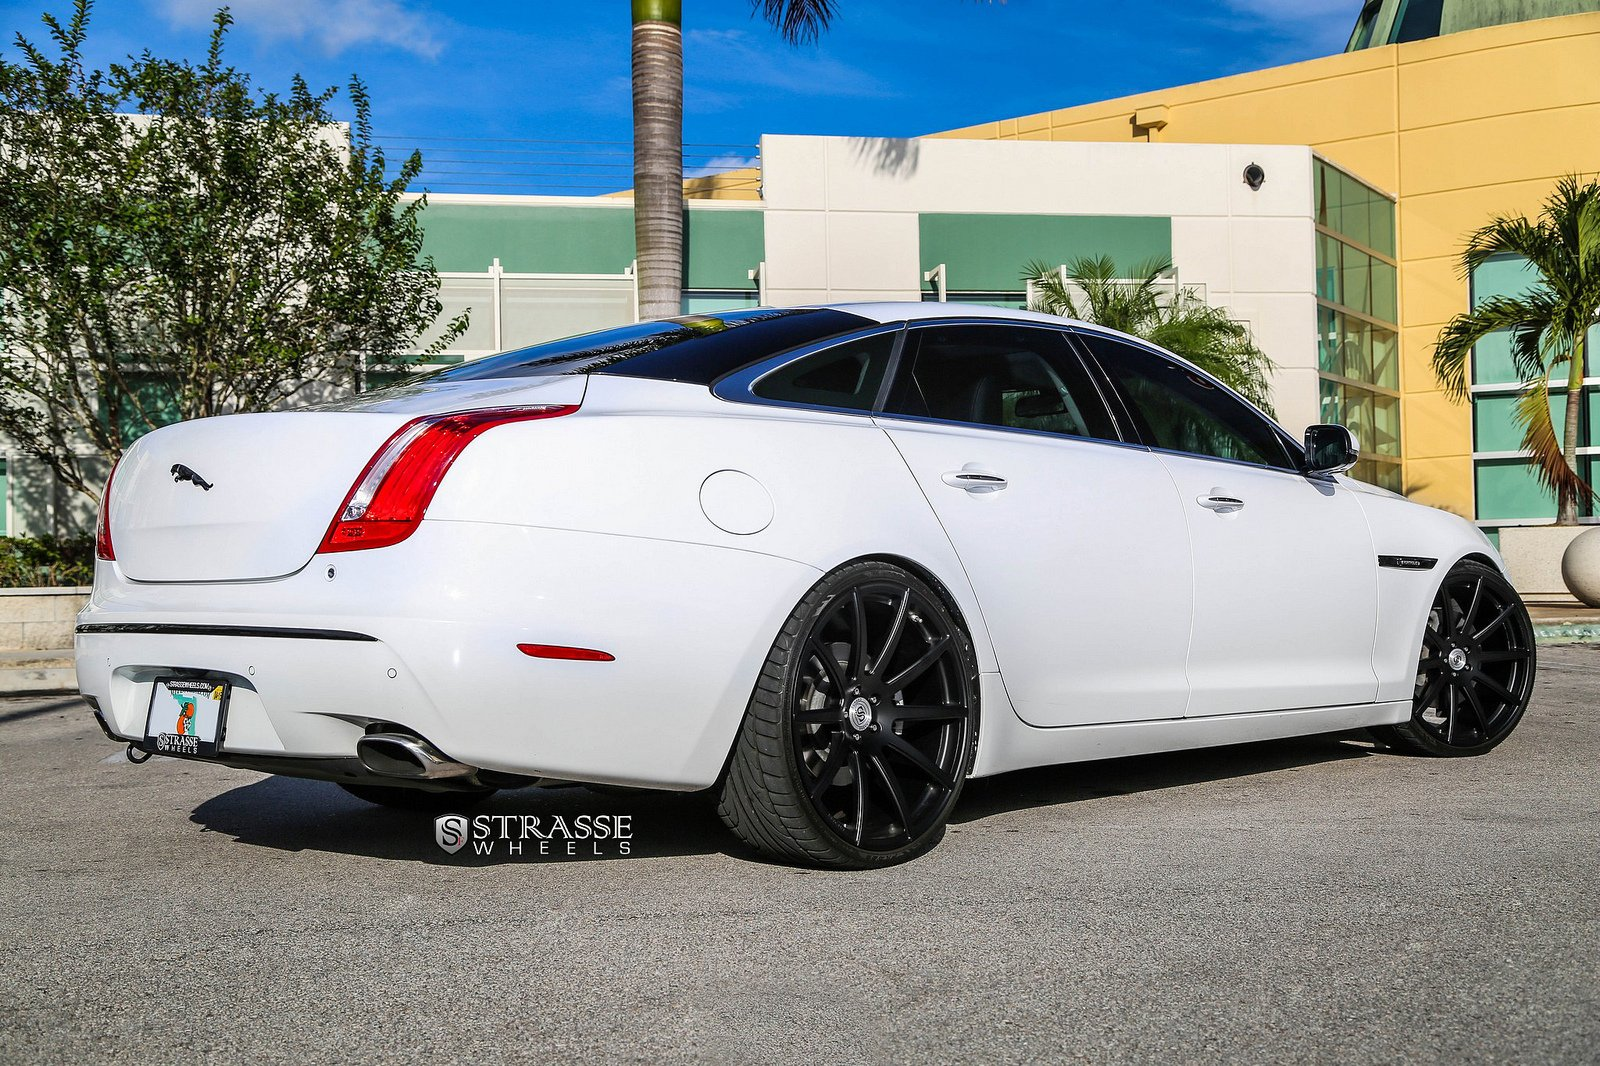 Jaguar Xjl Strasse Wheels Tuning Cars White Wallpaper 1600x1066 390218 Wallpaperup